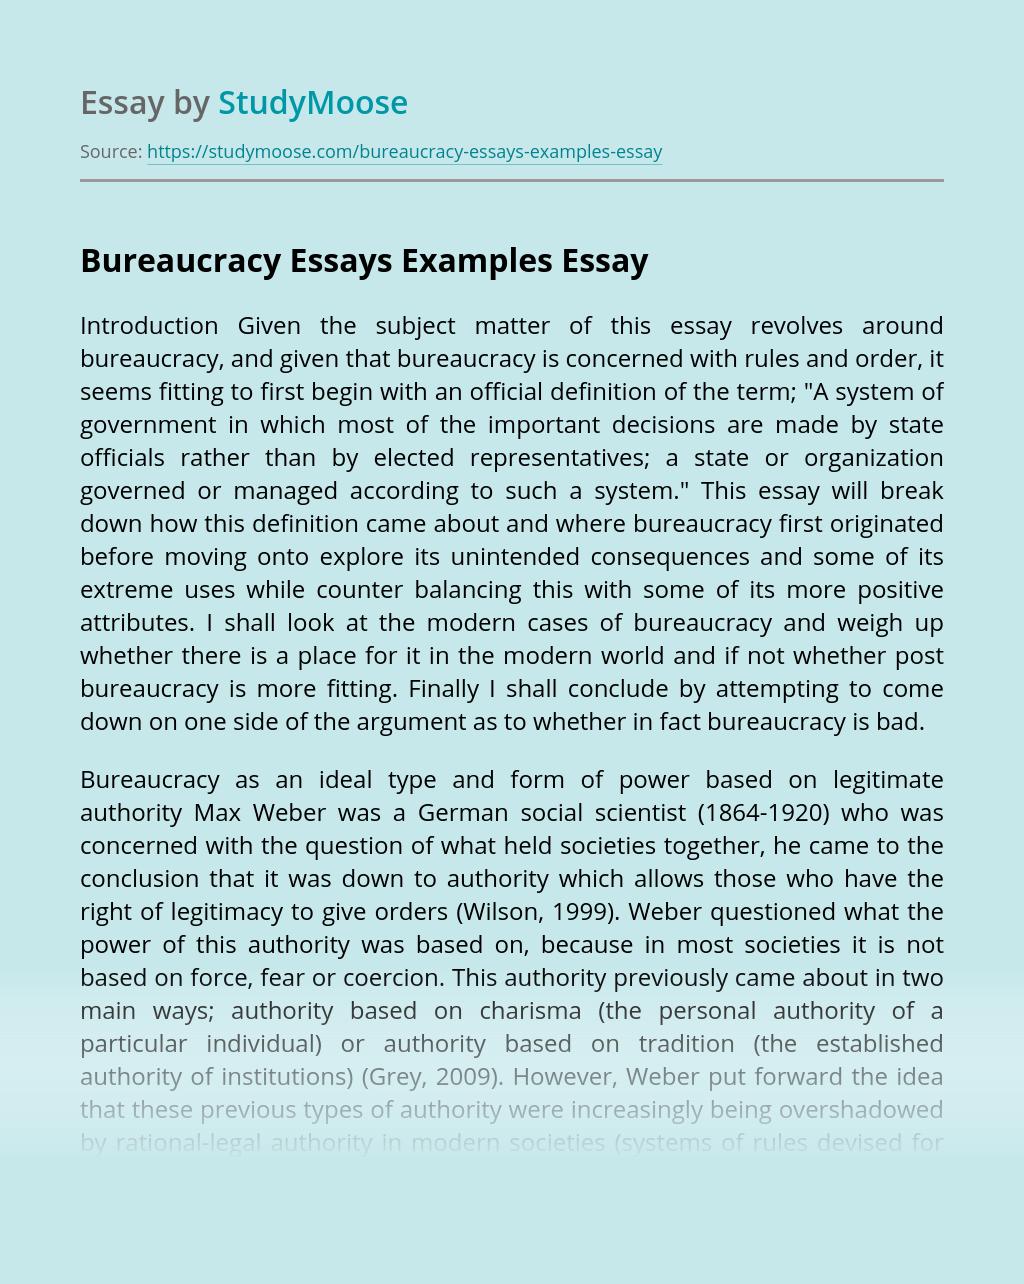 Bureaucracy Essays Examples